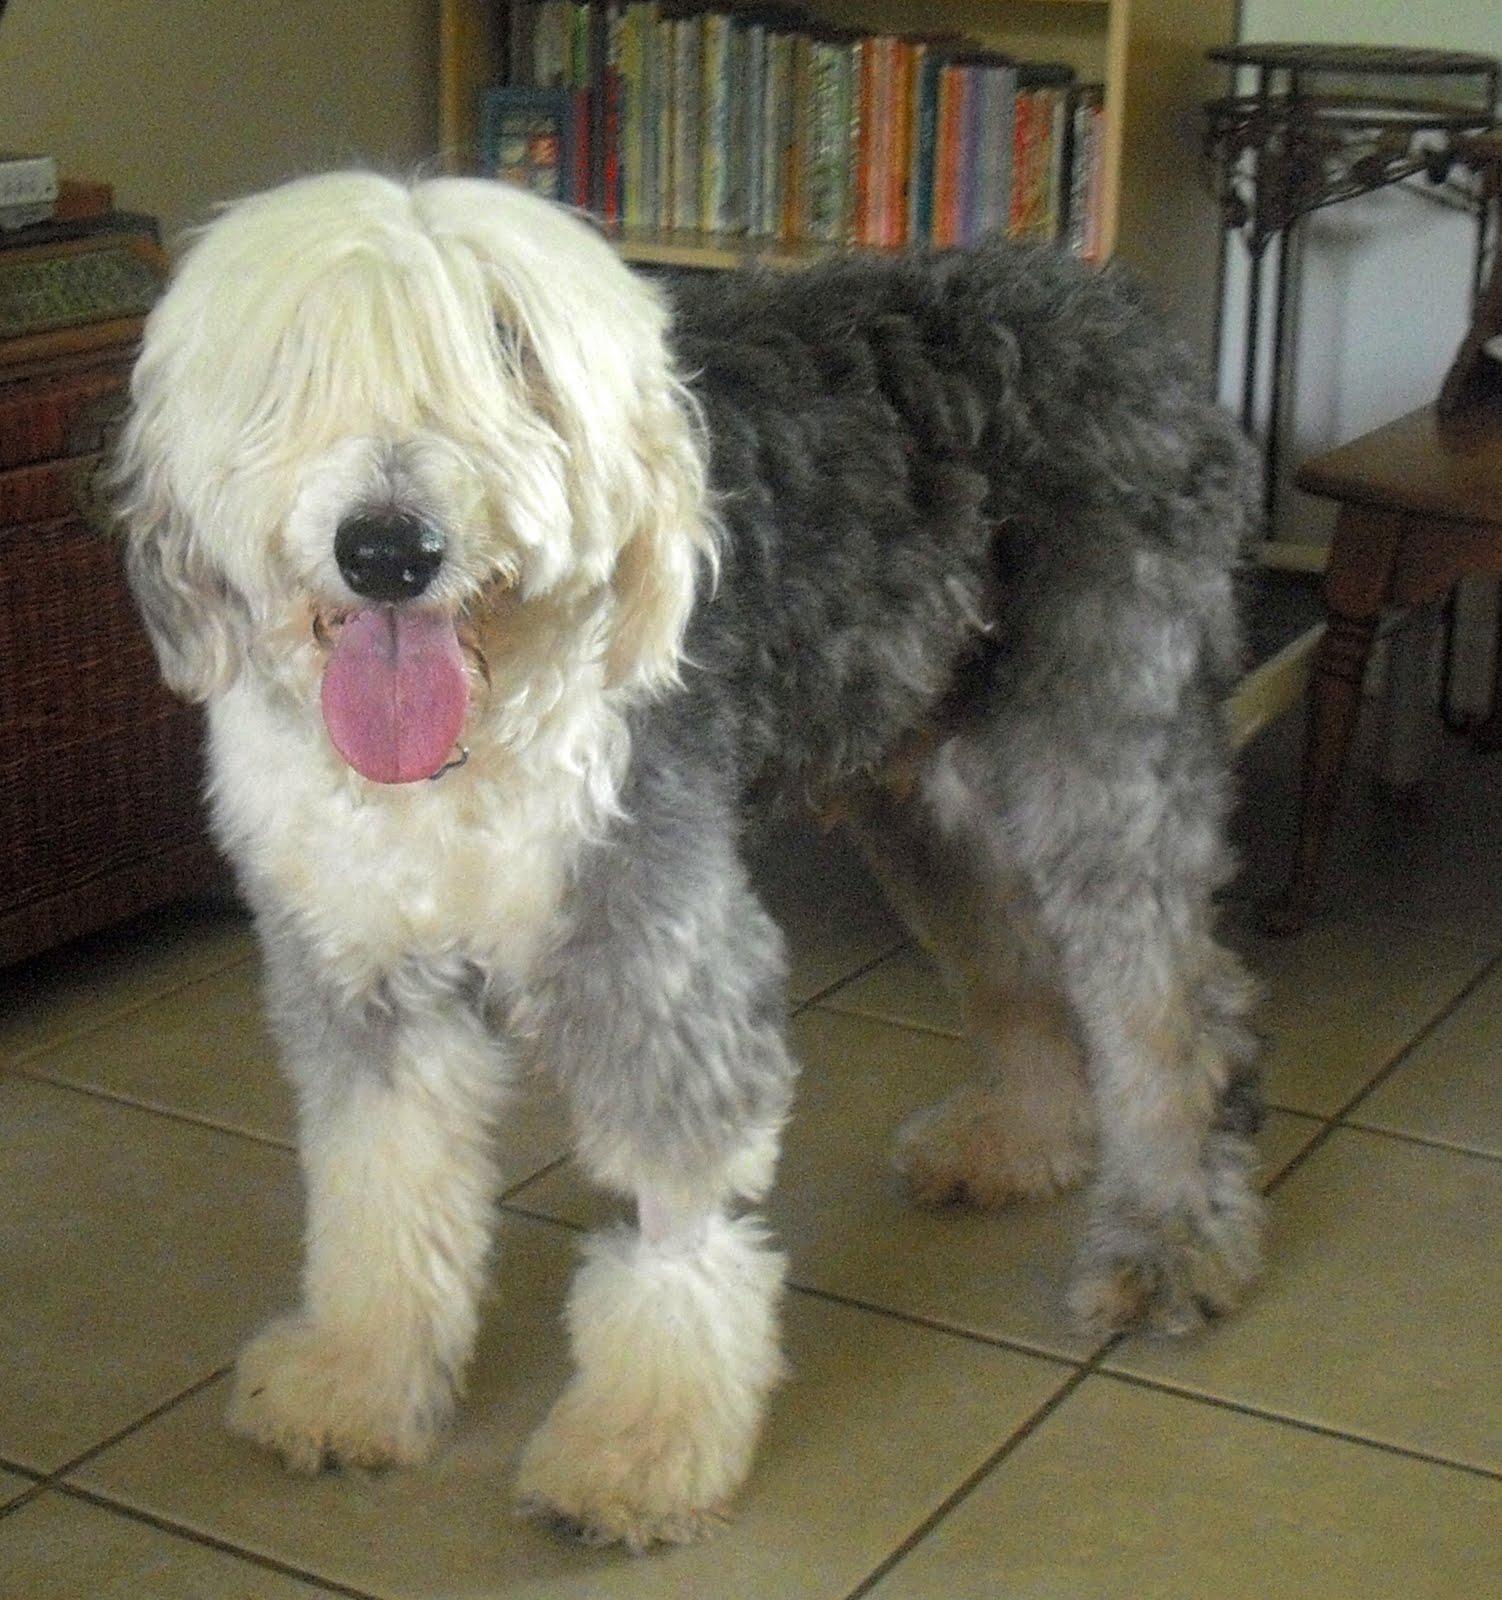 Tippy the Old English Sheepdog | The Dog Liberator™